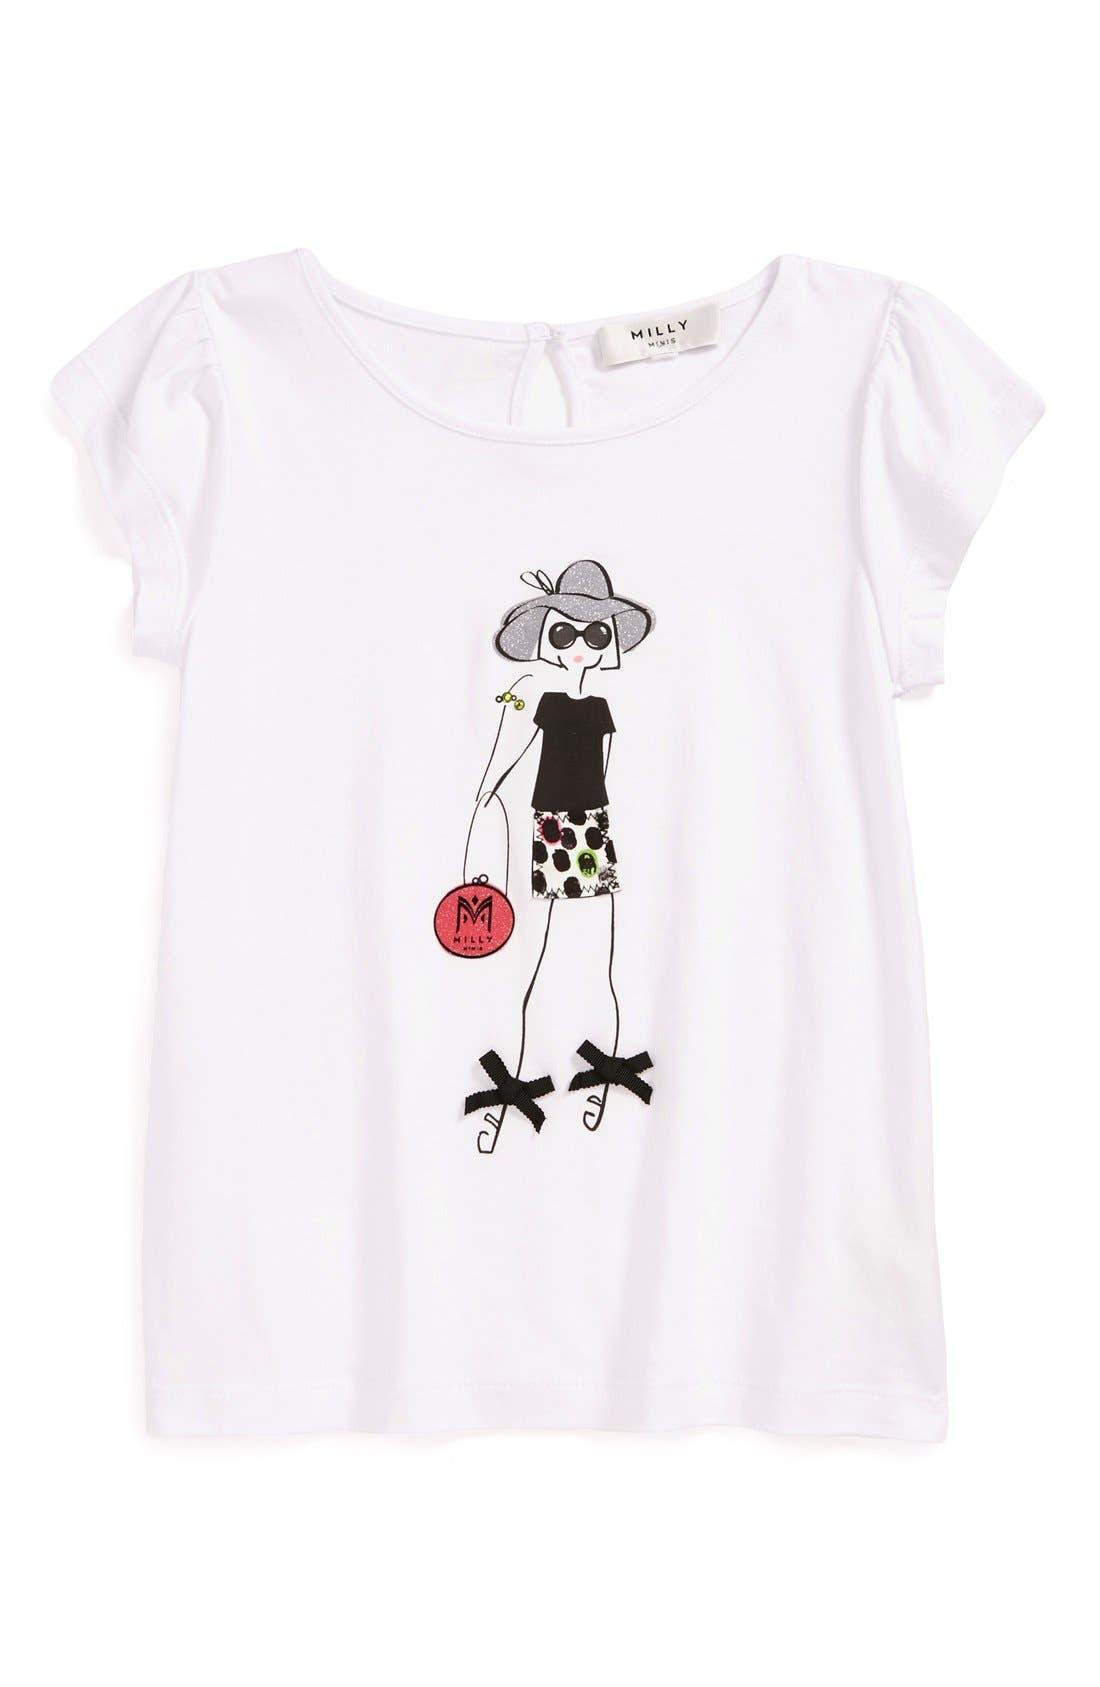 Alternate Image 1 Selected - Milly Minis Graphic Tee (Toddler Girls, Little Girls & Big Girls)